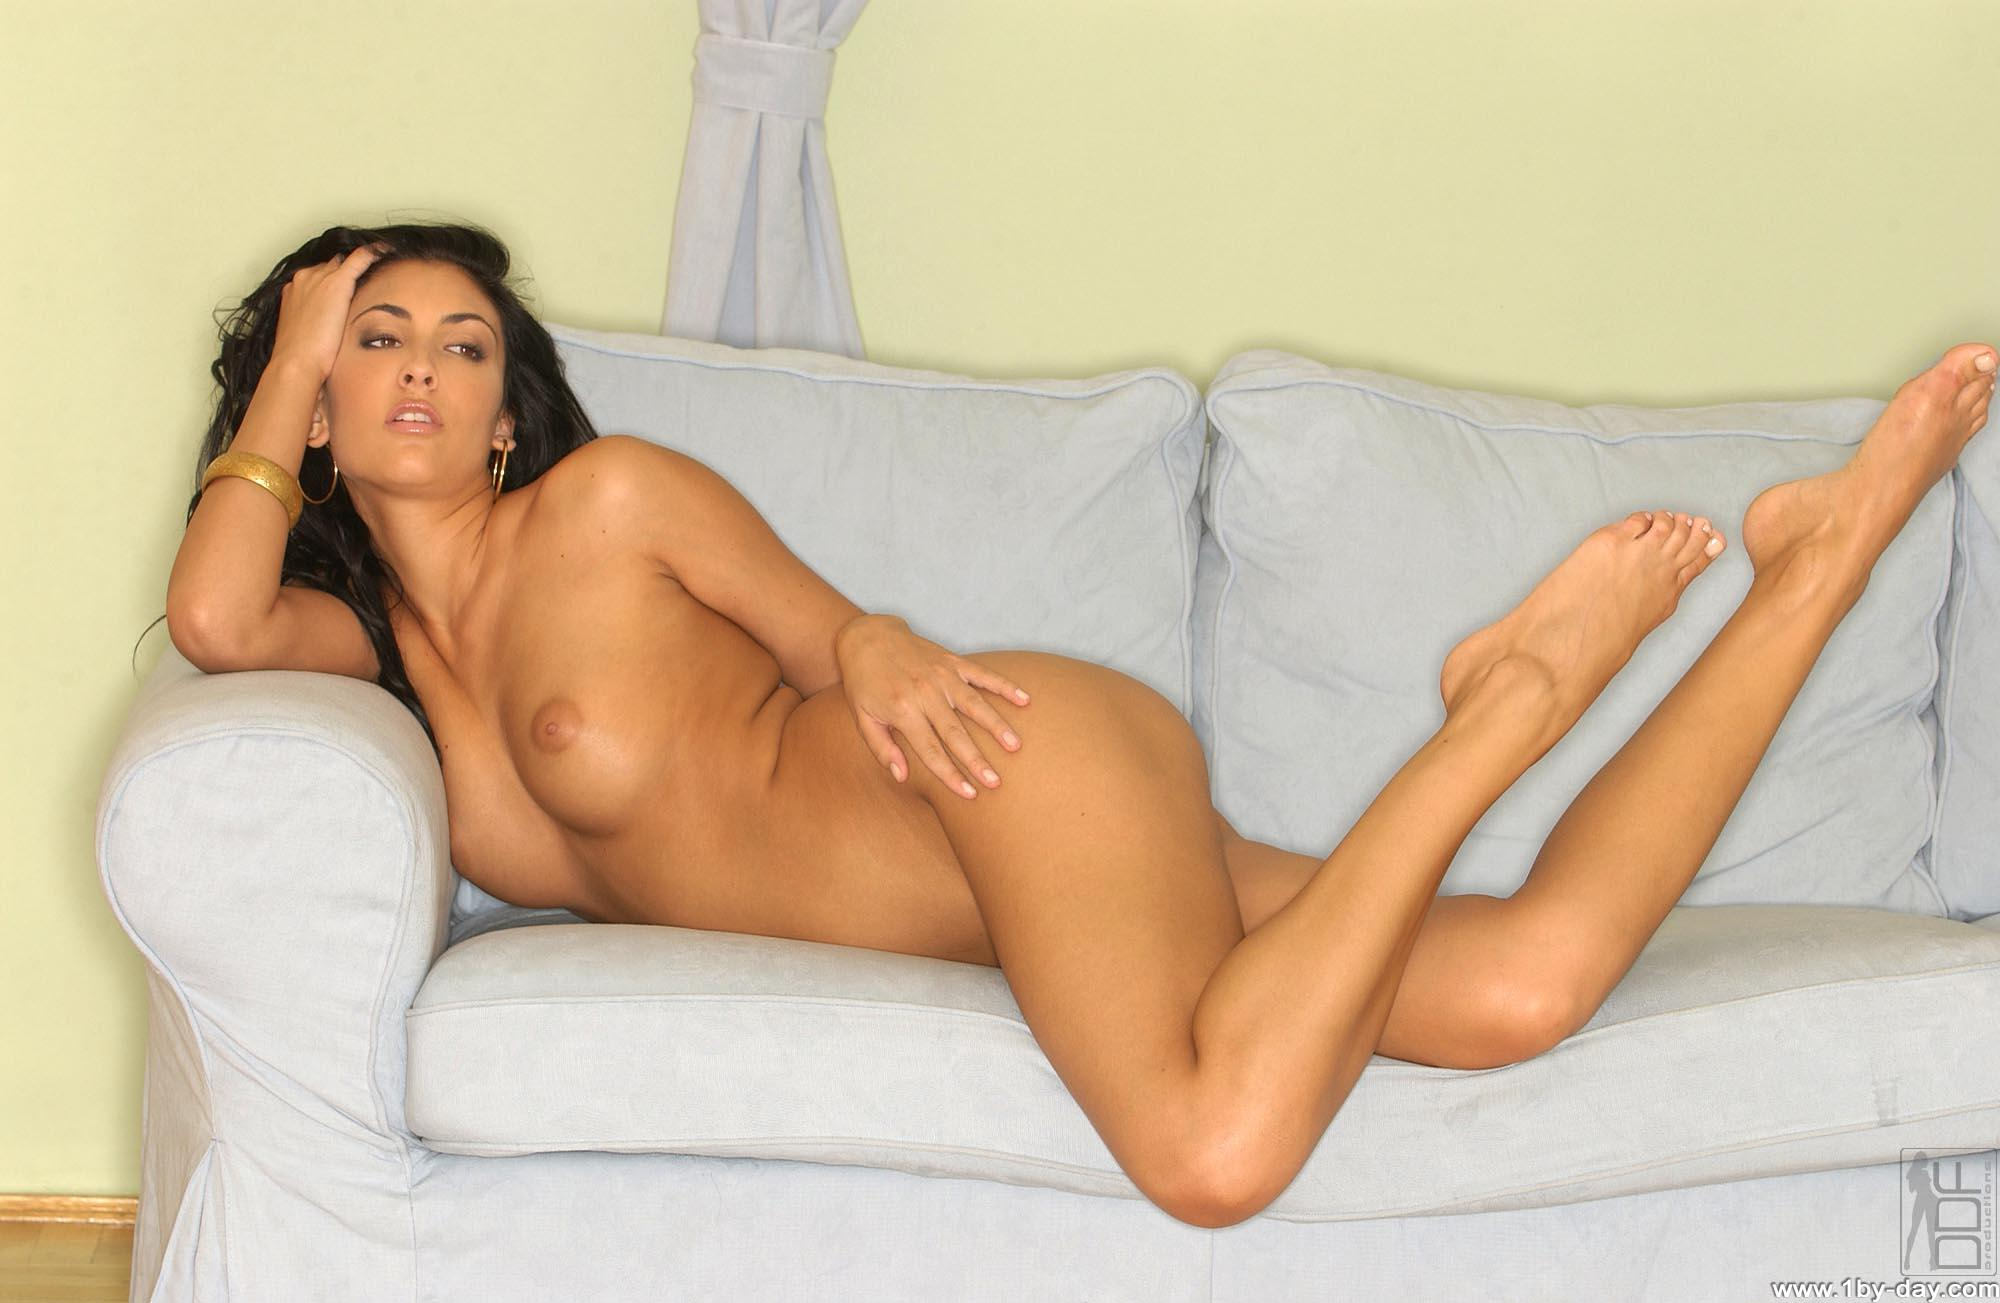 Yasmine fitzgerald porn